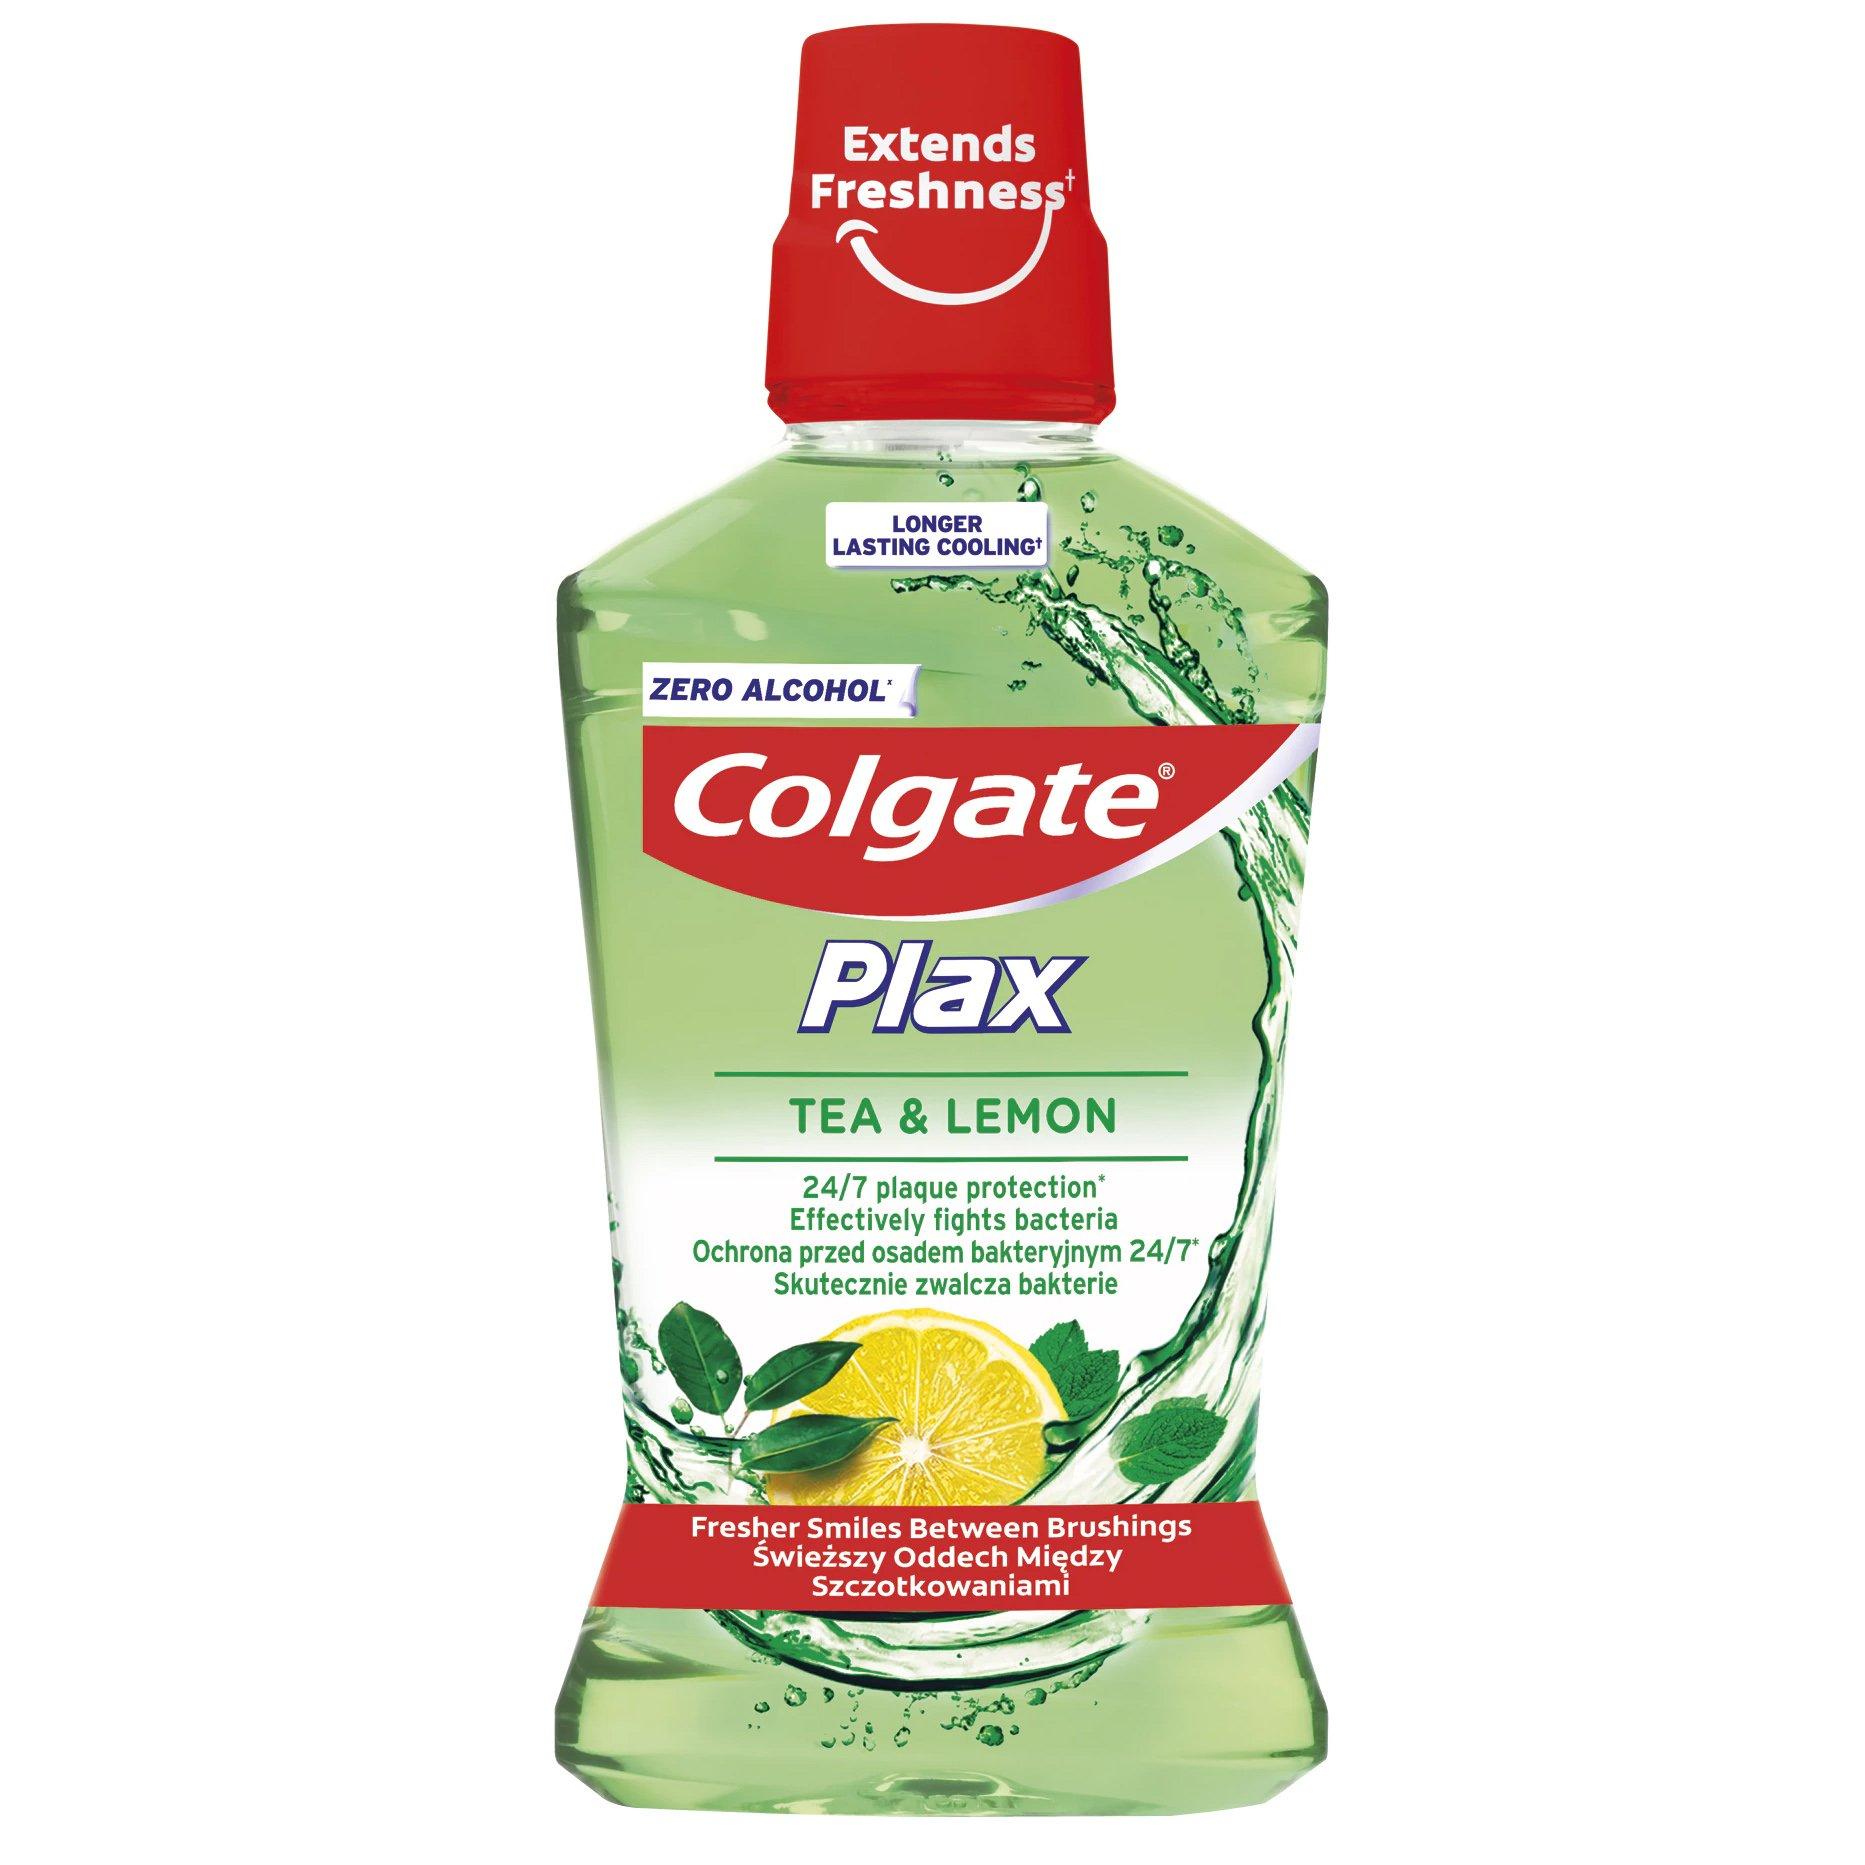 Colgate Plax Tea & Lemon 24/7 Plaque Protection Στοματικό Διάλυμα με Τσάι & Λεμόνι για Προστασία Από την Πλάκα, τα Βακτήρια